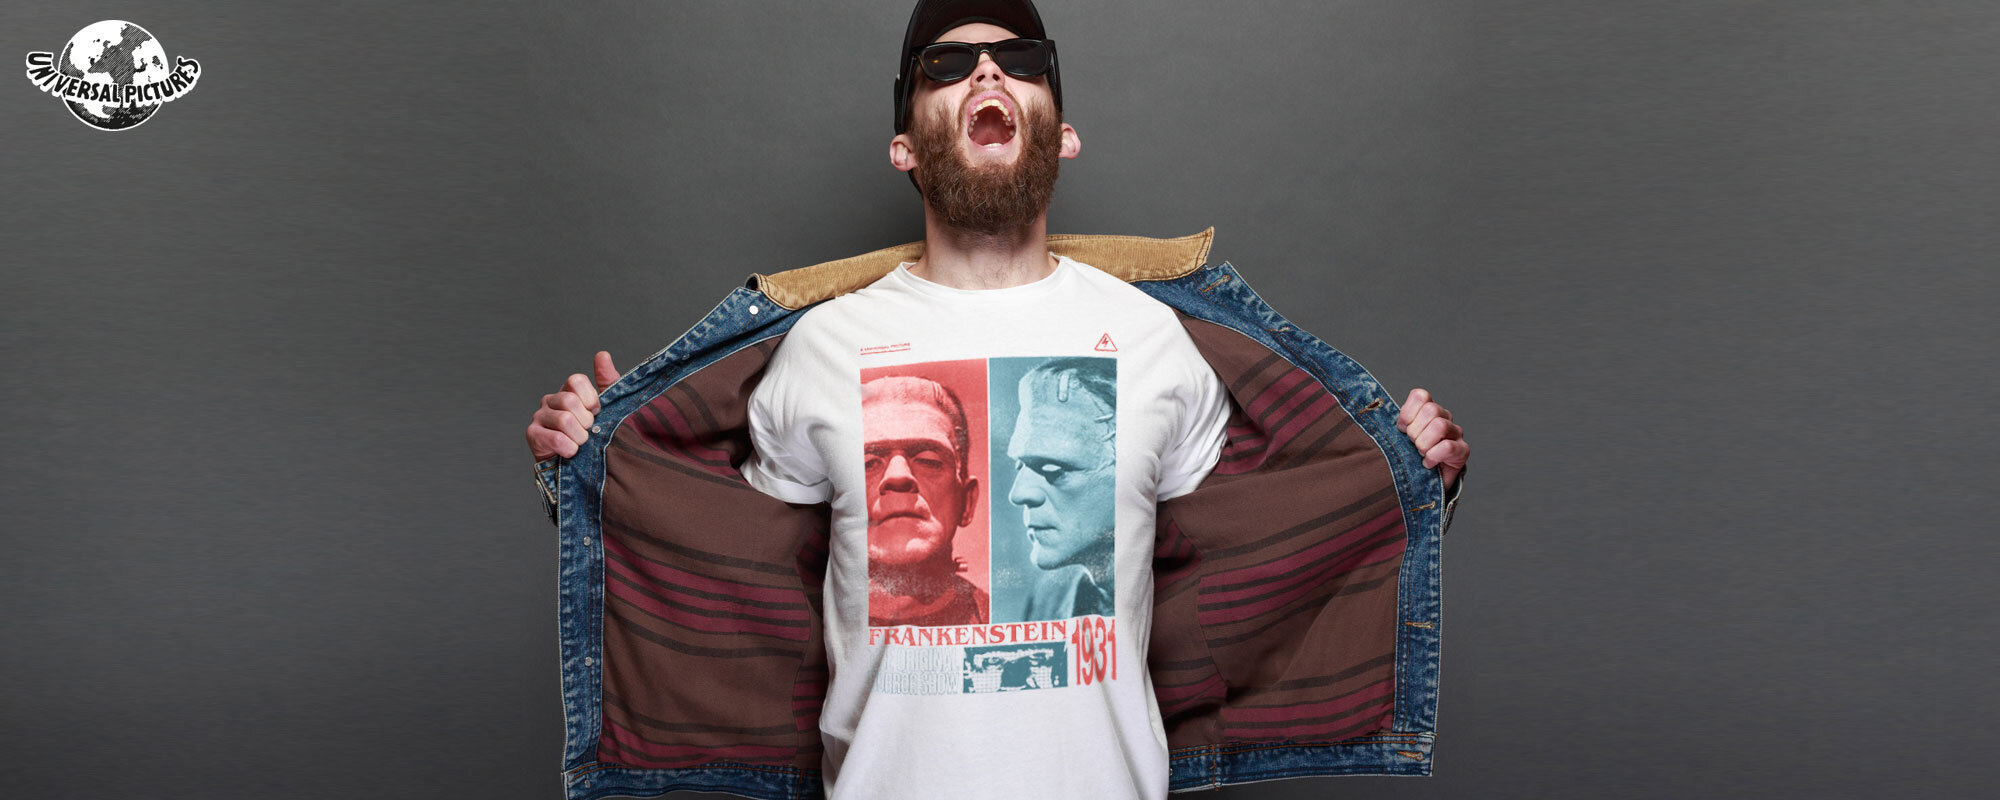 https://www.shirt-store.com/pub_docs/files/Startsida2021/2021-UniversalMonsters.jpg